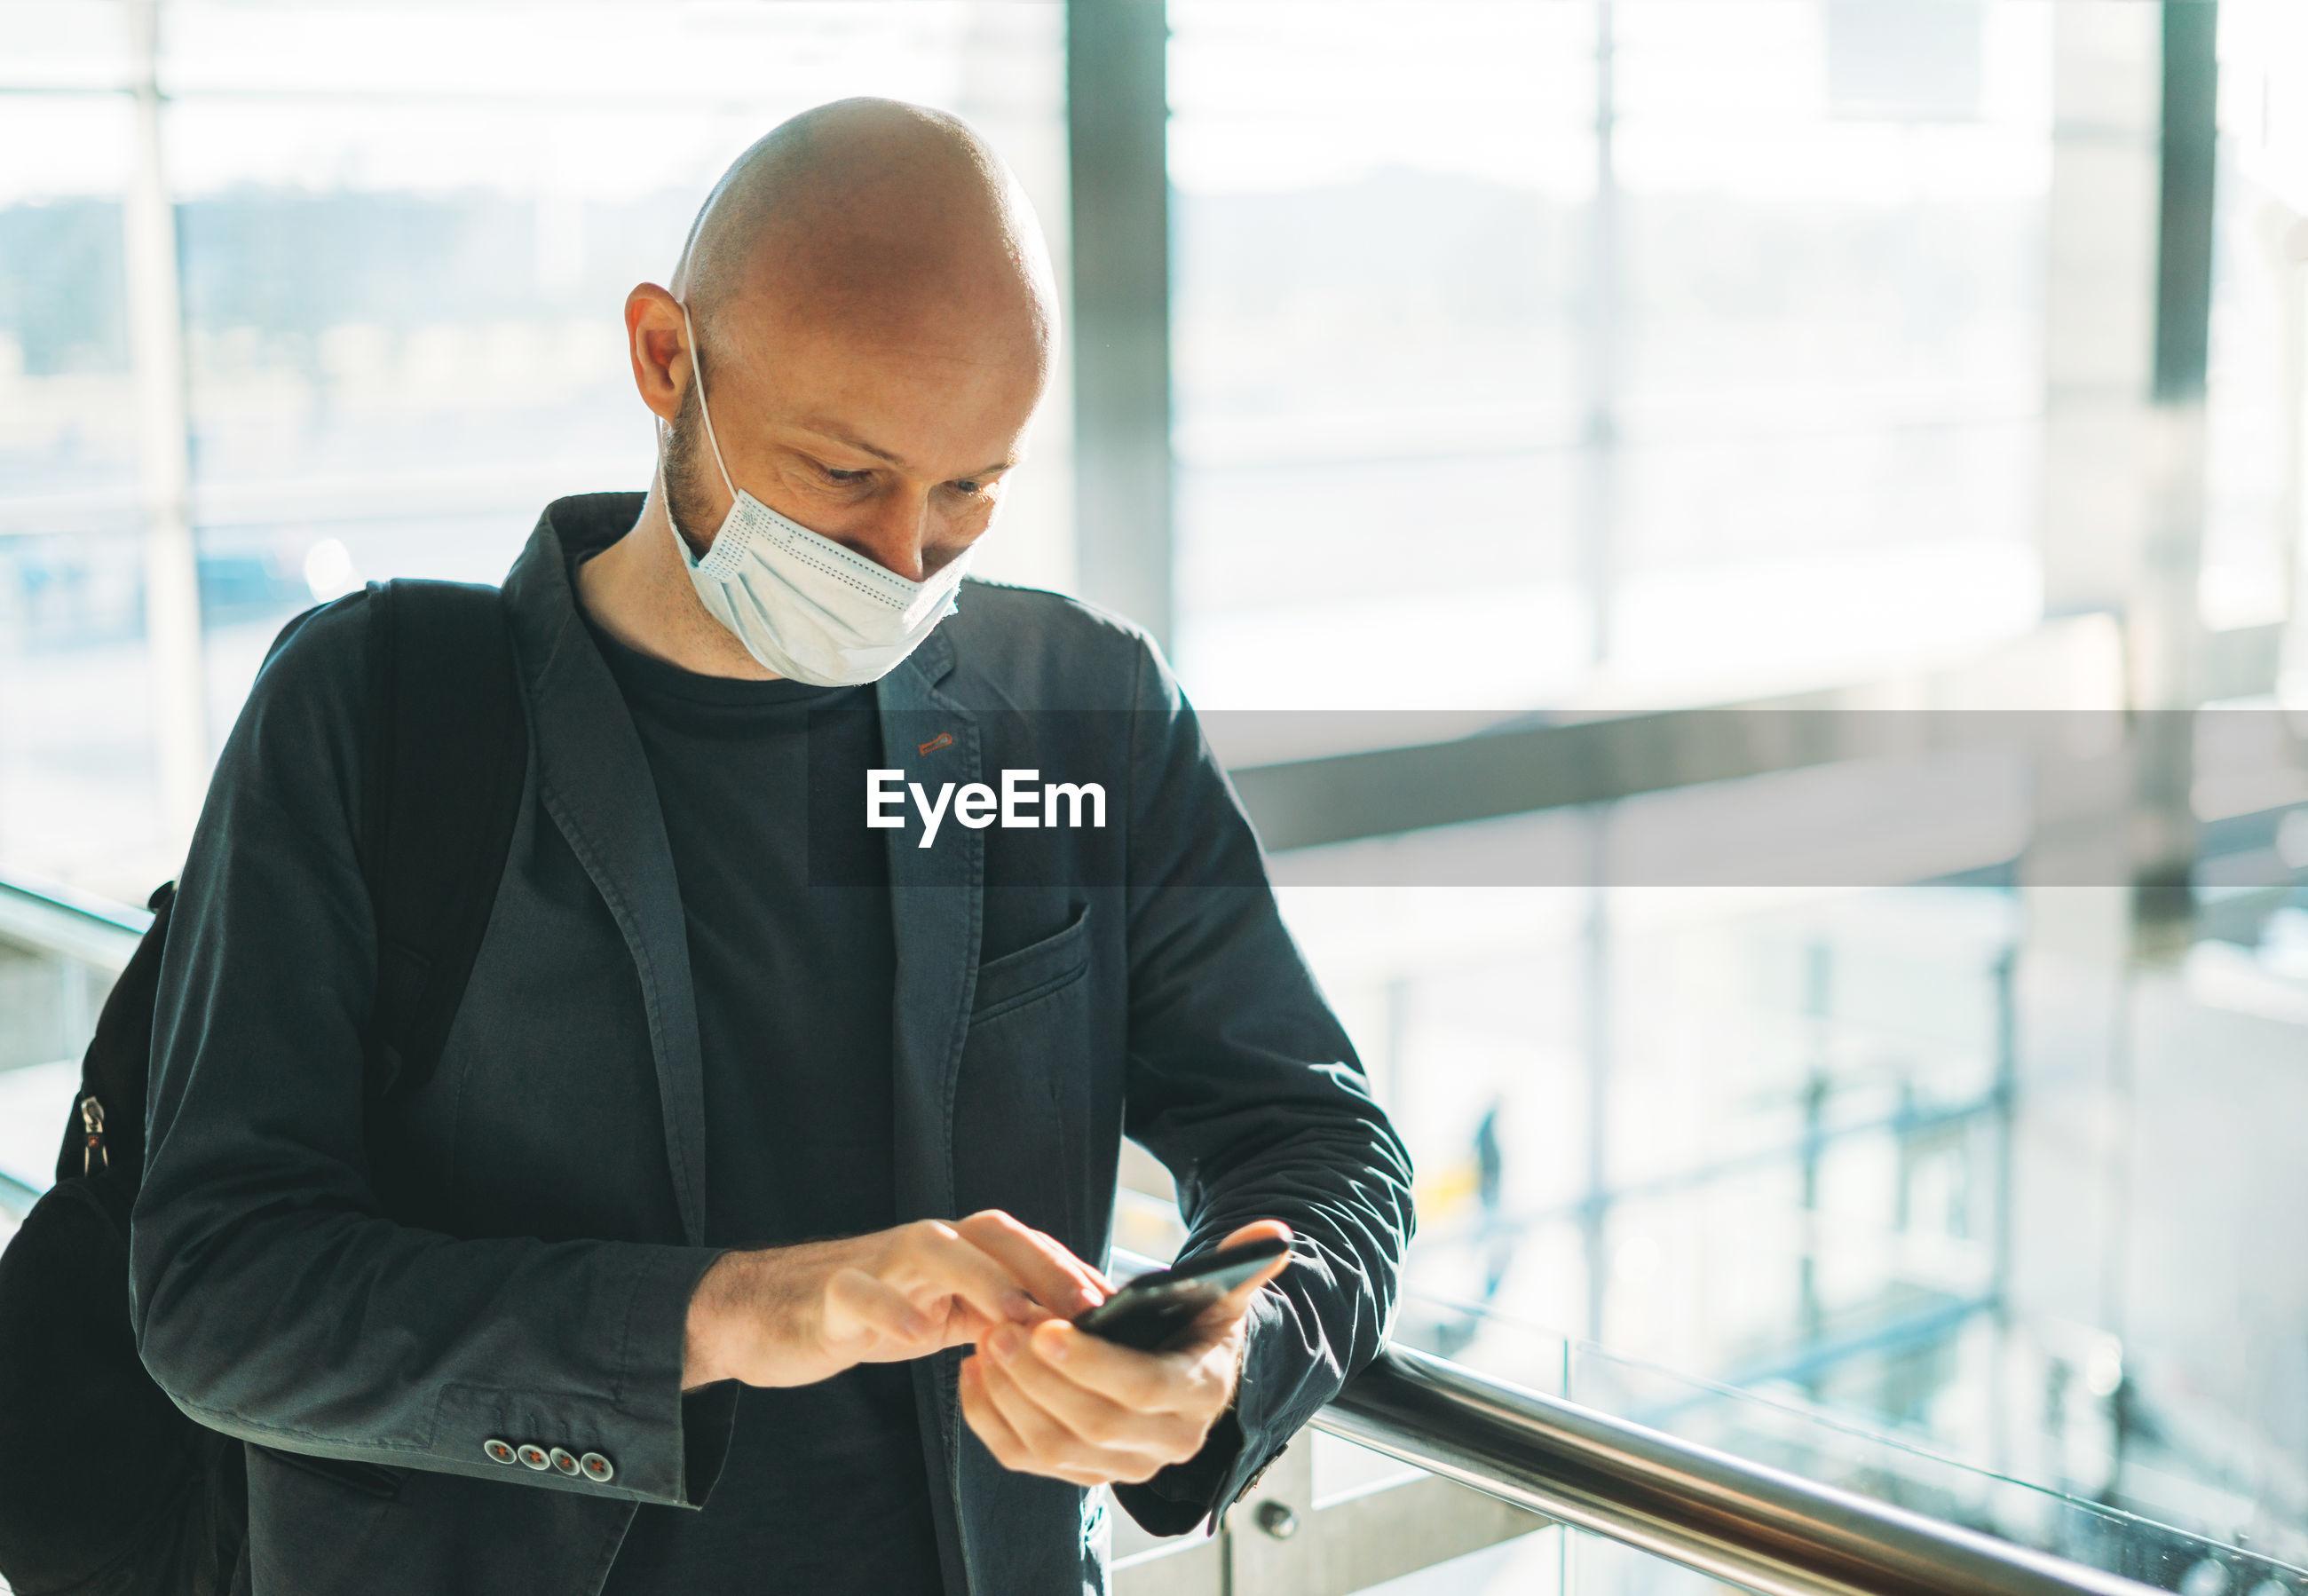 FULL LENGTH OF A MAN USING MOBILE PHONE